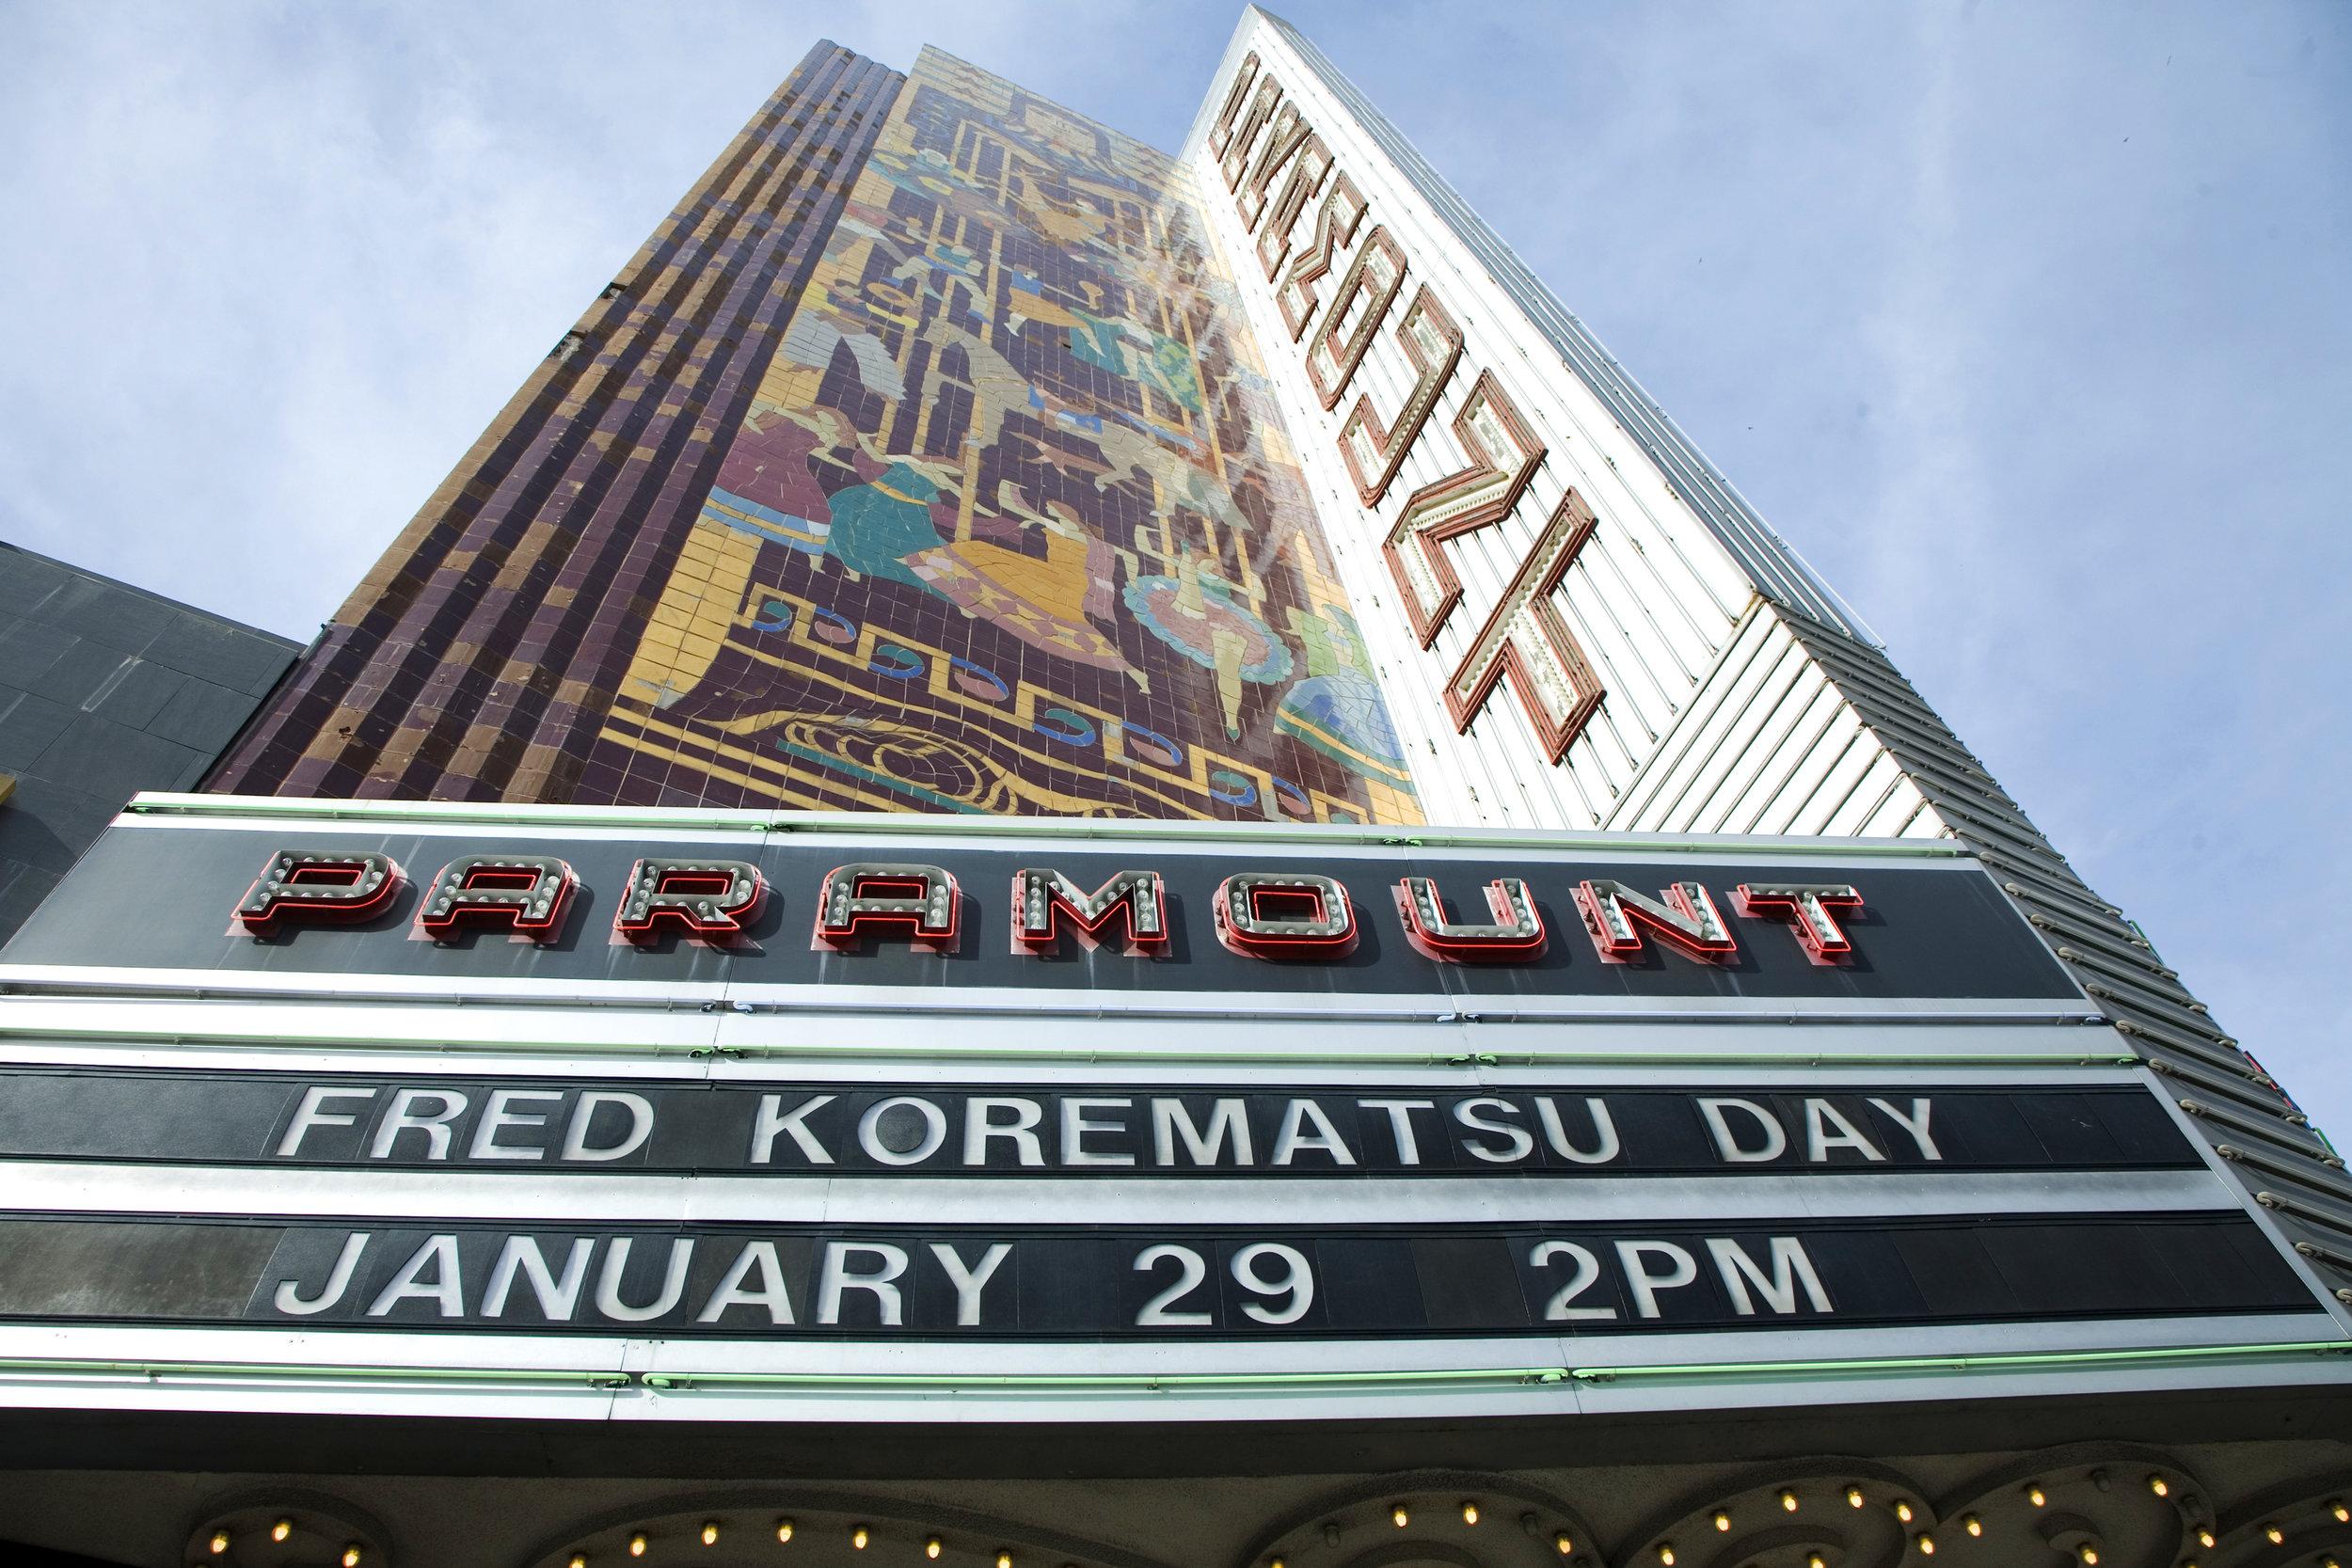 7th Annual Fred Korematsu Day